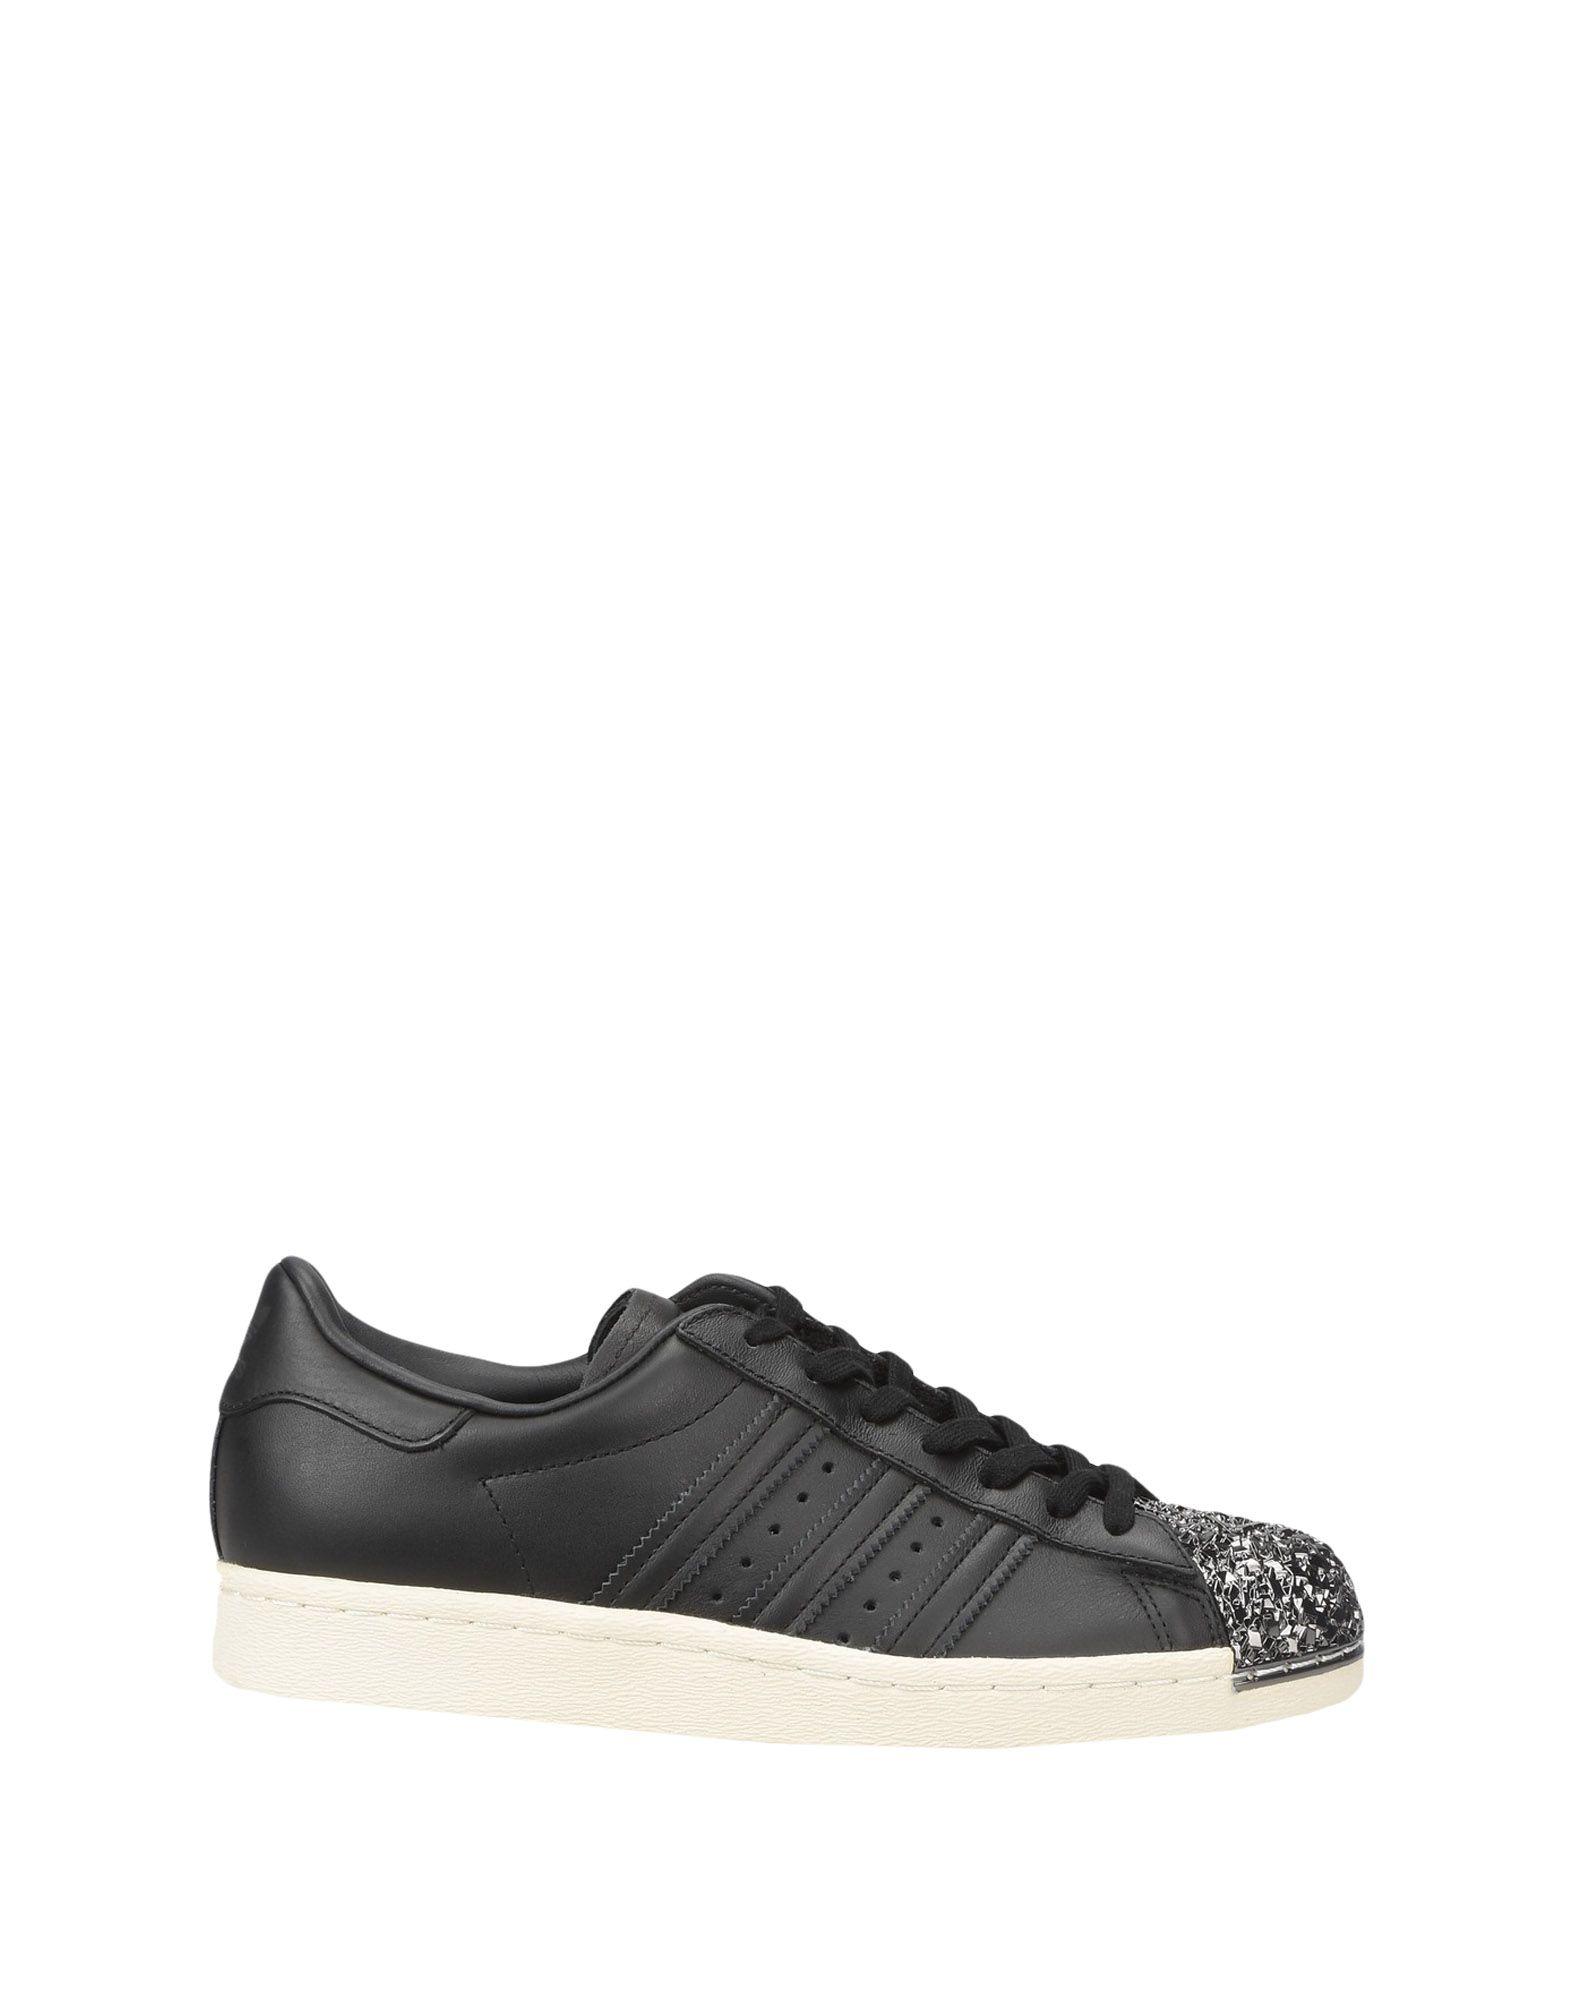 Adidas 3D Originals Superstar 80S 3D Adidas Mt  11215274JI 80feac